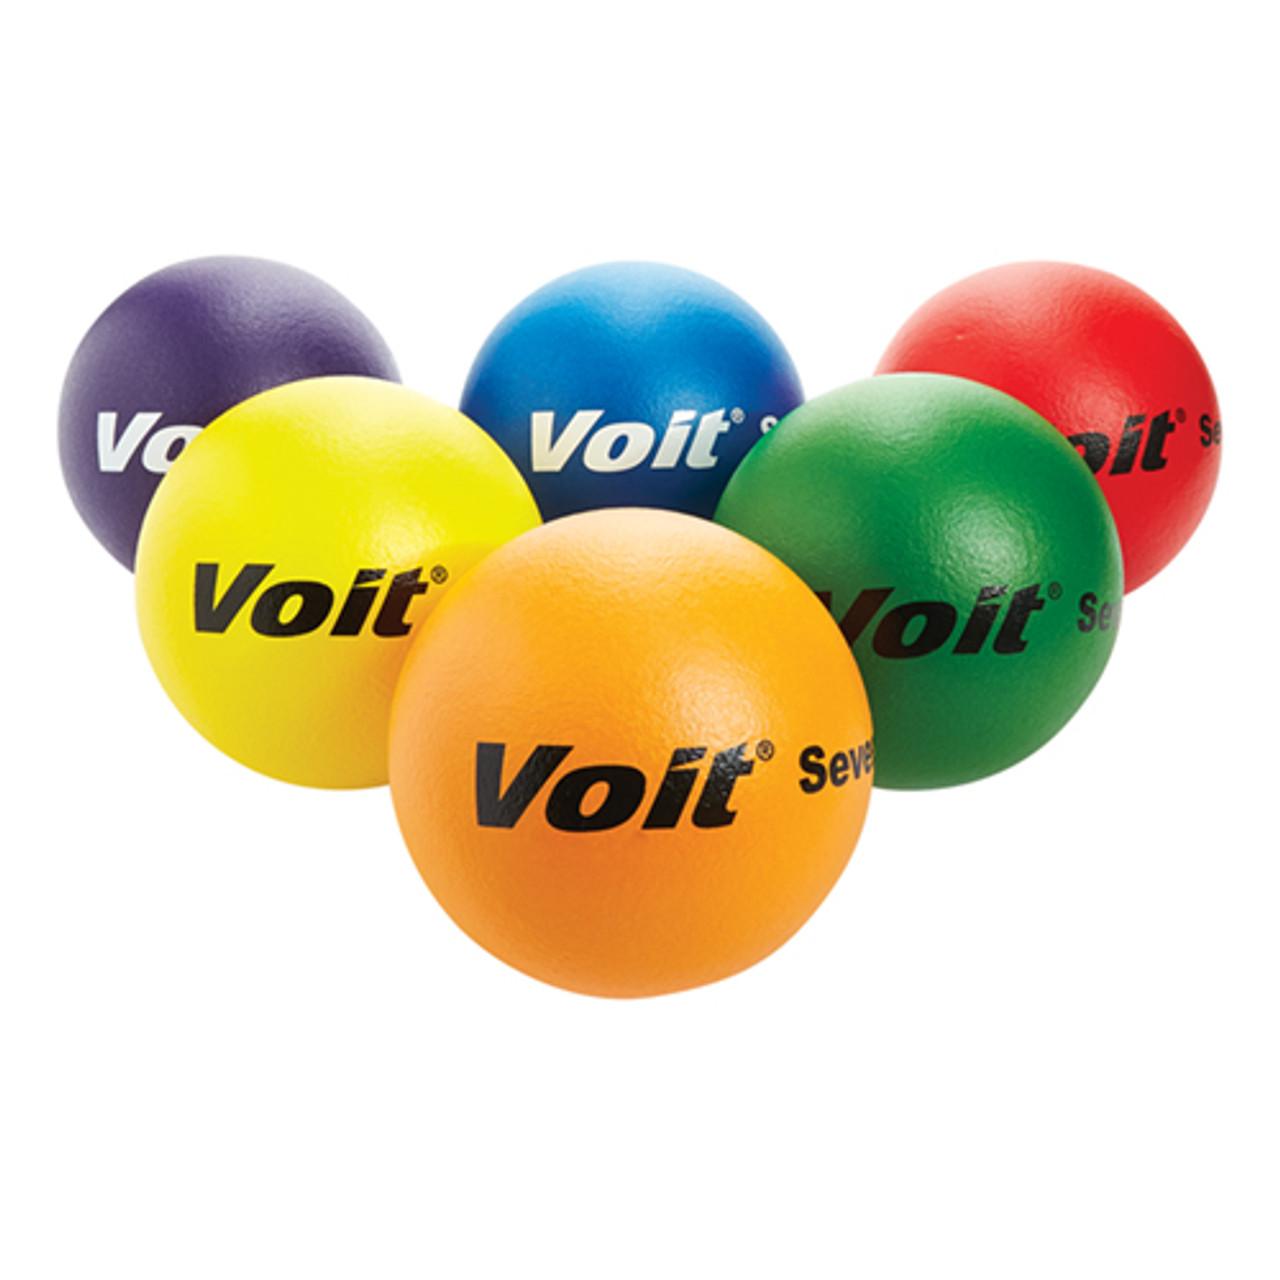 Voit Soft-Low Bounce Tuff Balls